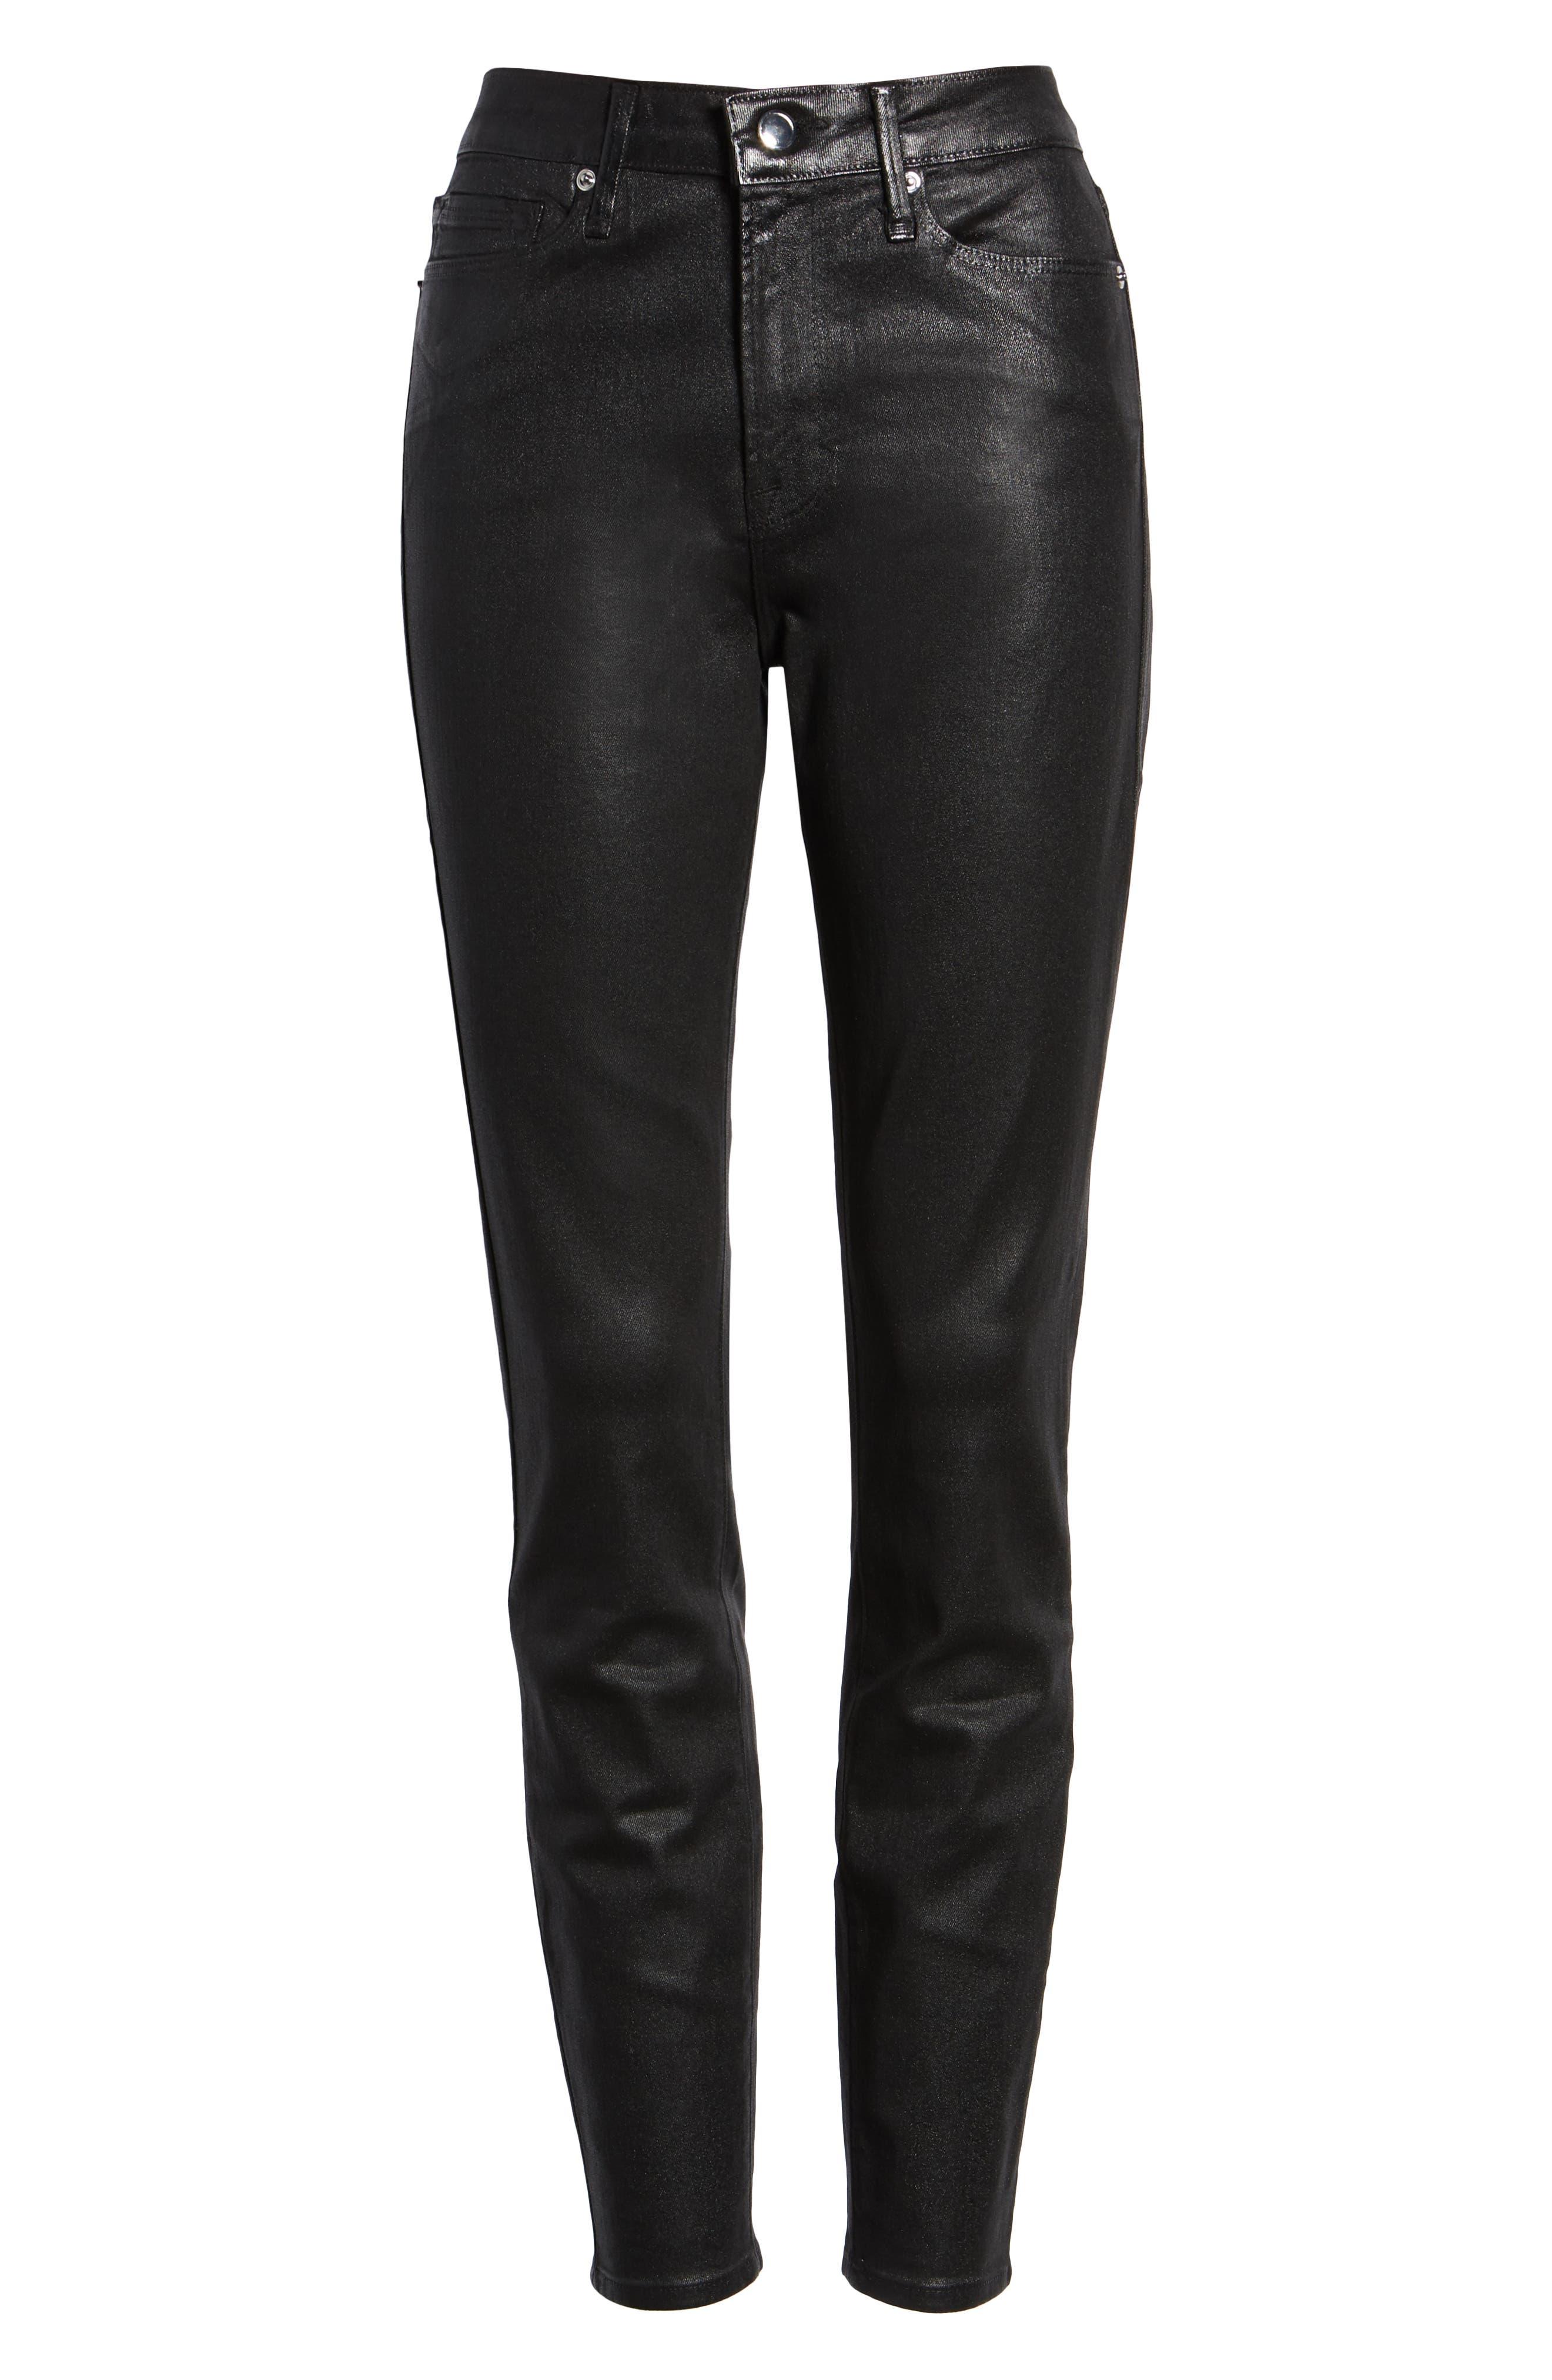 GOOD AMERICAN, Good Legs High Waist Skinny Jeans, Alternate thumbnail 6, color, BLACK